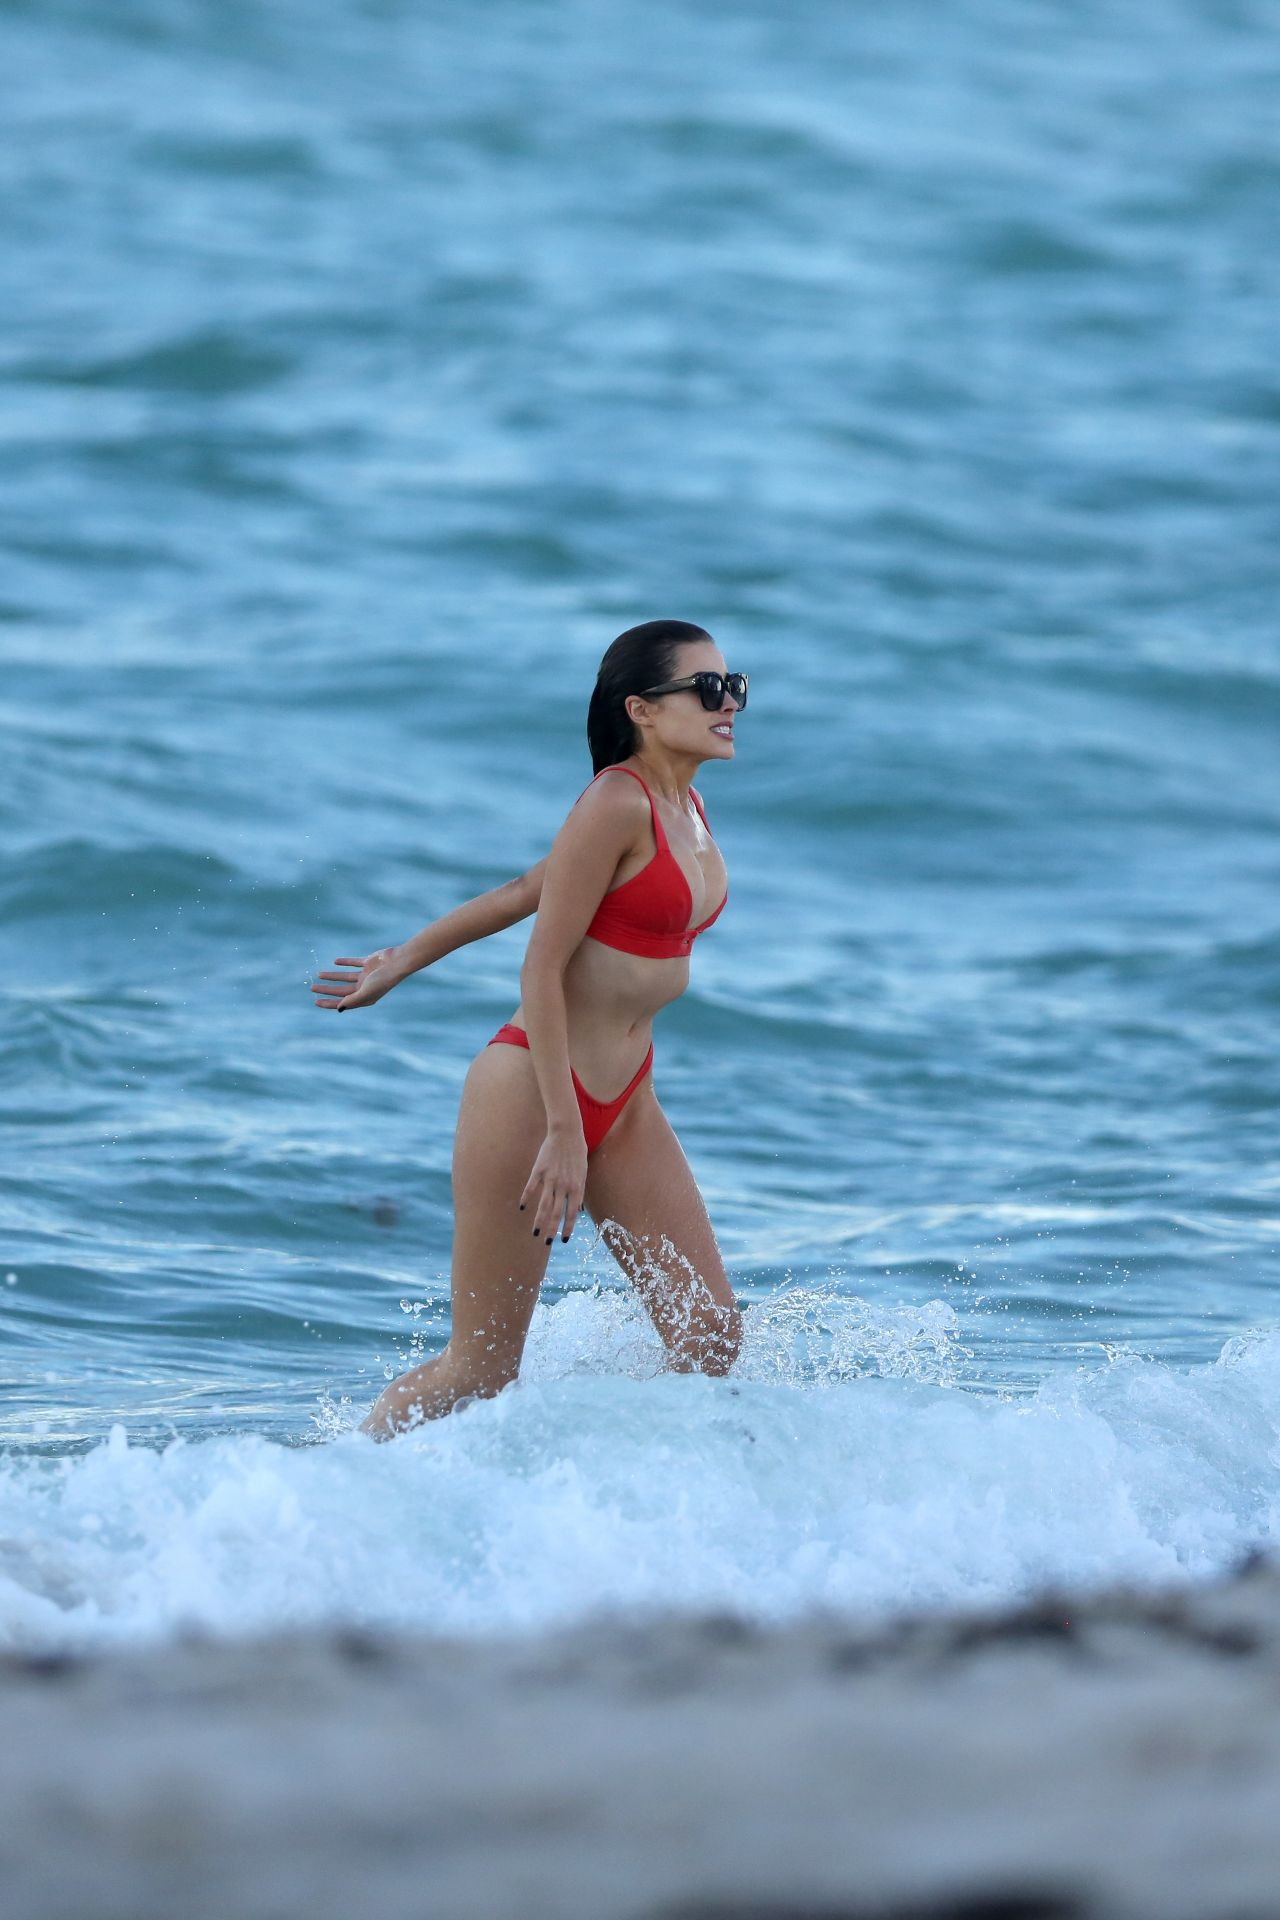 Shanina Shaik Caroline Lowe Olivia Culpo and Daniela Braga in Bikini Photoshoot in Miami Beach Pics 1 of 35